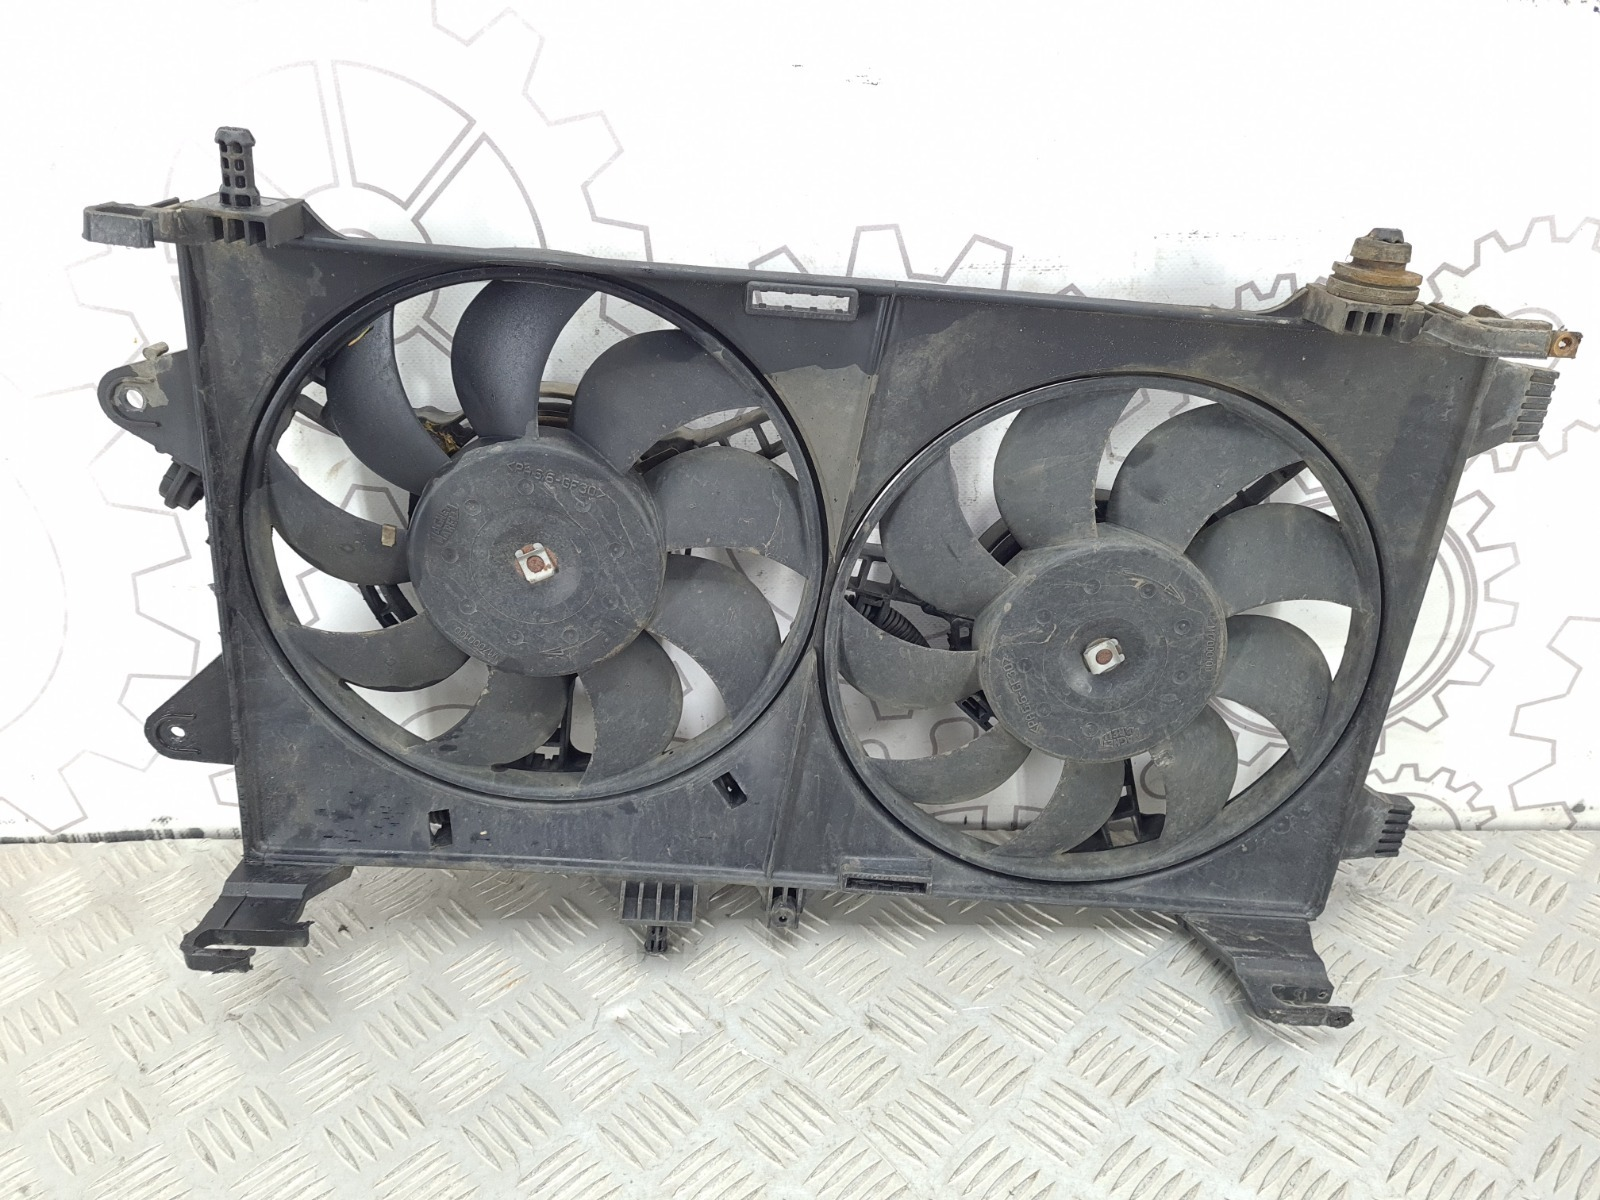 Вентилятор радиатора Fiat Punto 2 1.8 I 2004 (б/у)